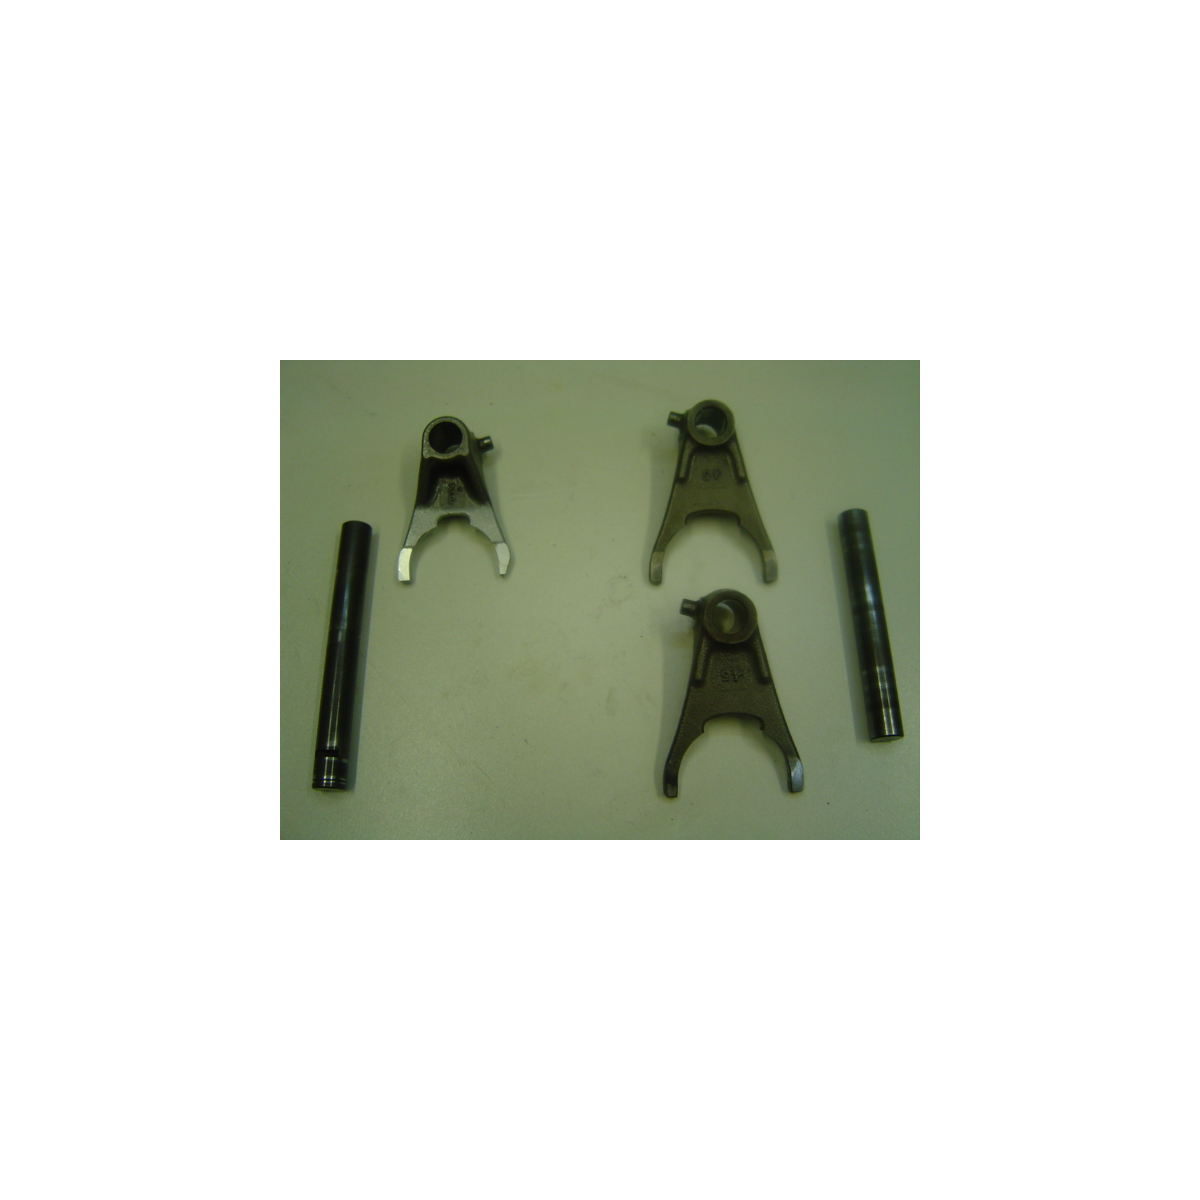 Axe et fourchette de boîte SUZUKI 450 LTR 2008